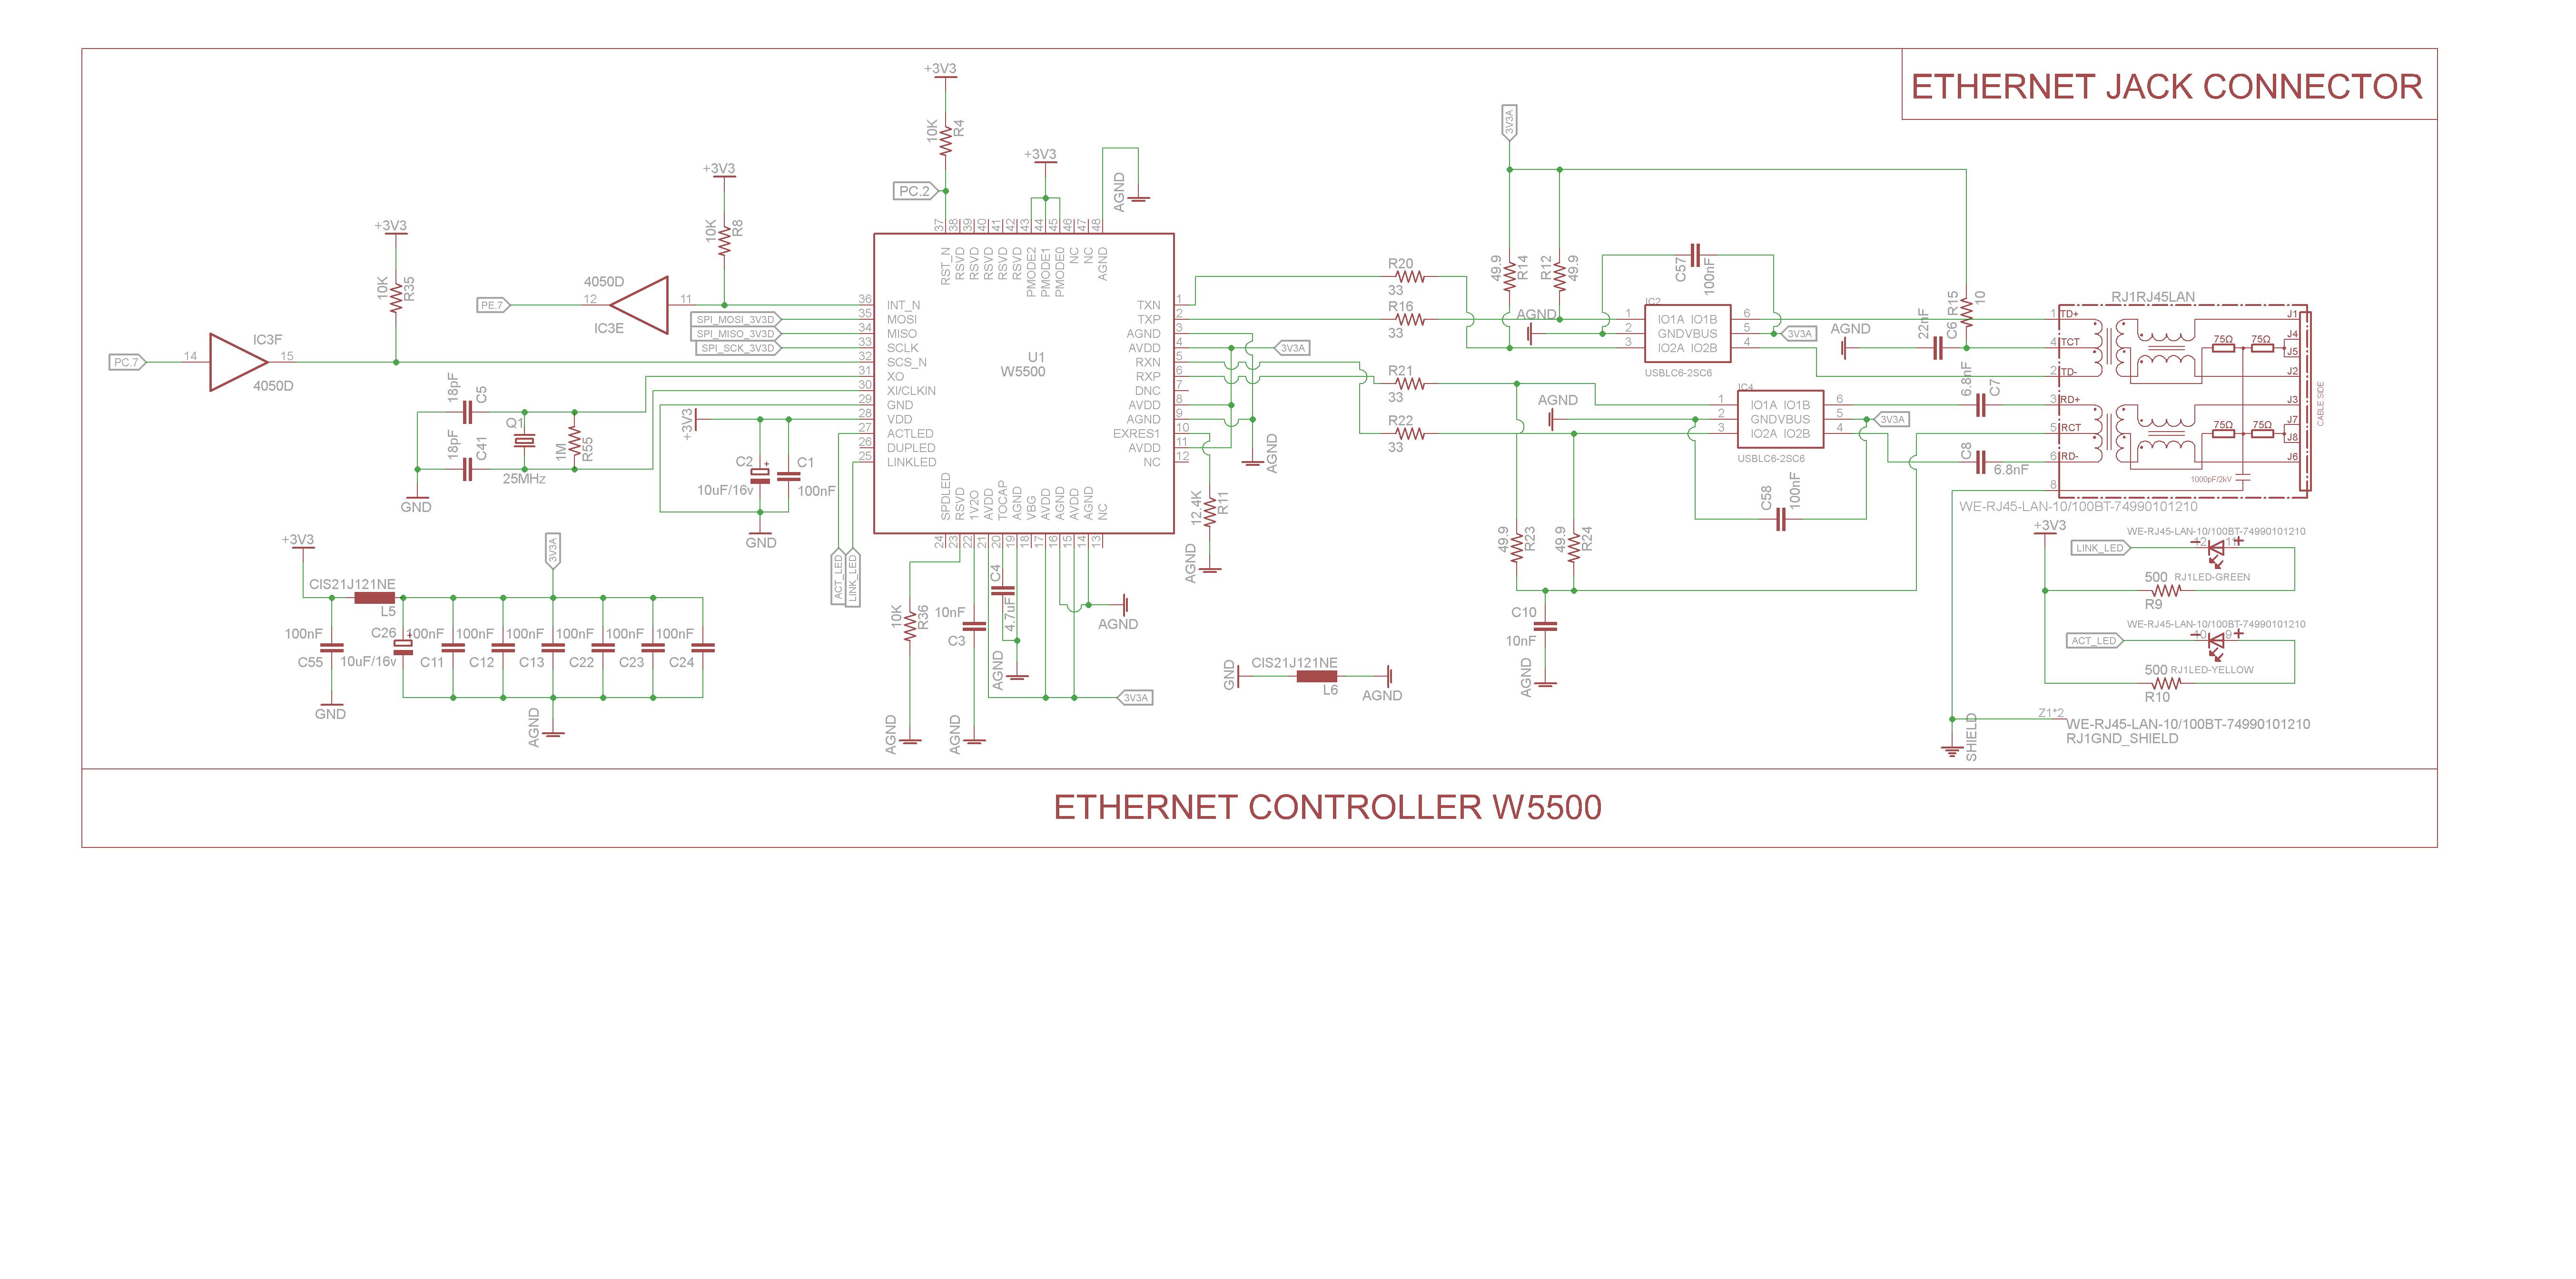 Diagram 2007 Gmc W5500 Wiring Diagram Full Version Hd Quality Wiring Diagram Stoneswiring2k Atuttasosta It